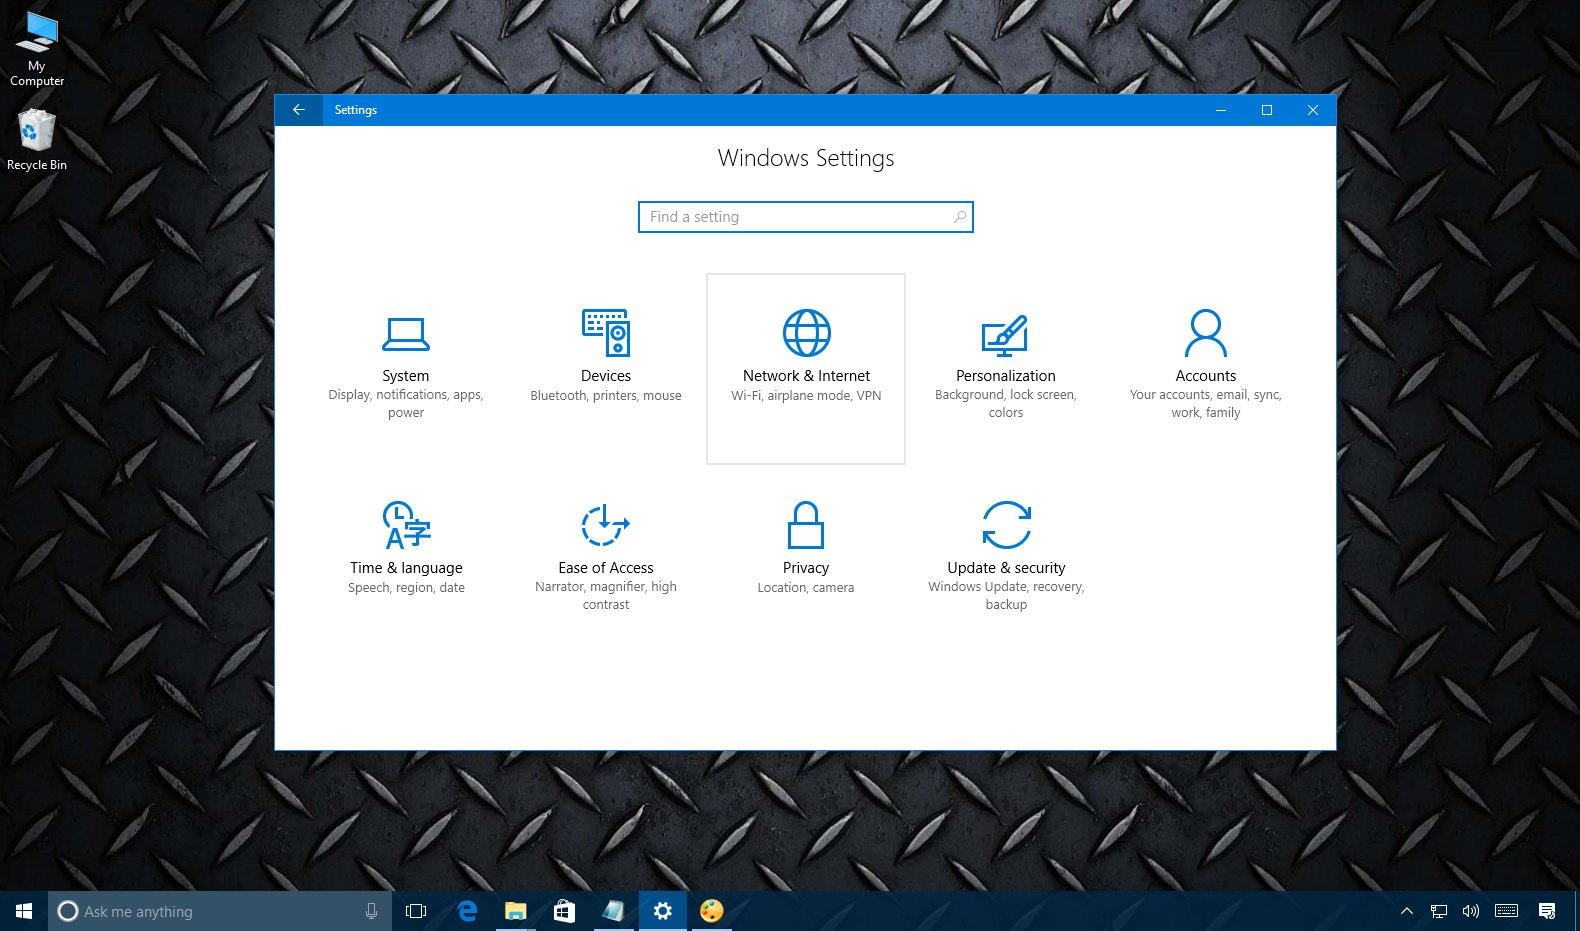 Windows 10 Network & Internet settings